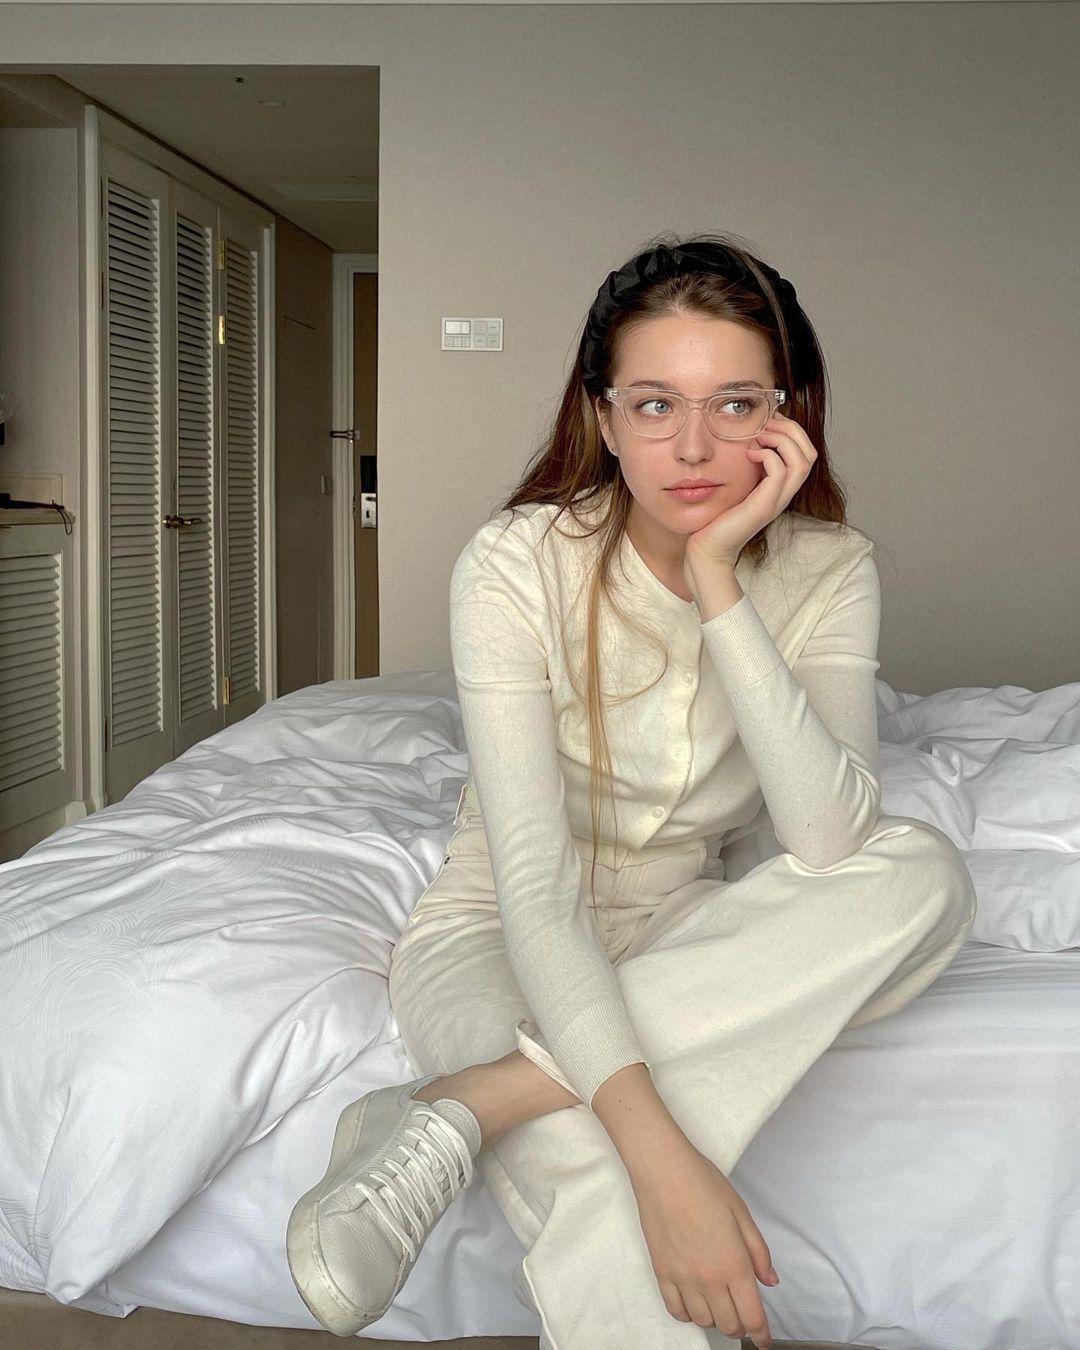 Angelina-Danilova-Wallpapers-Insta-Fit-Bio-2